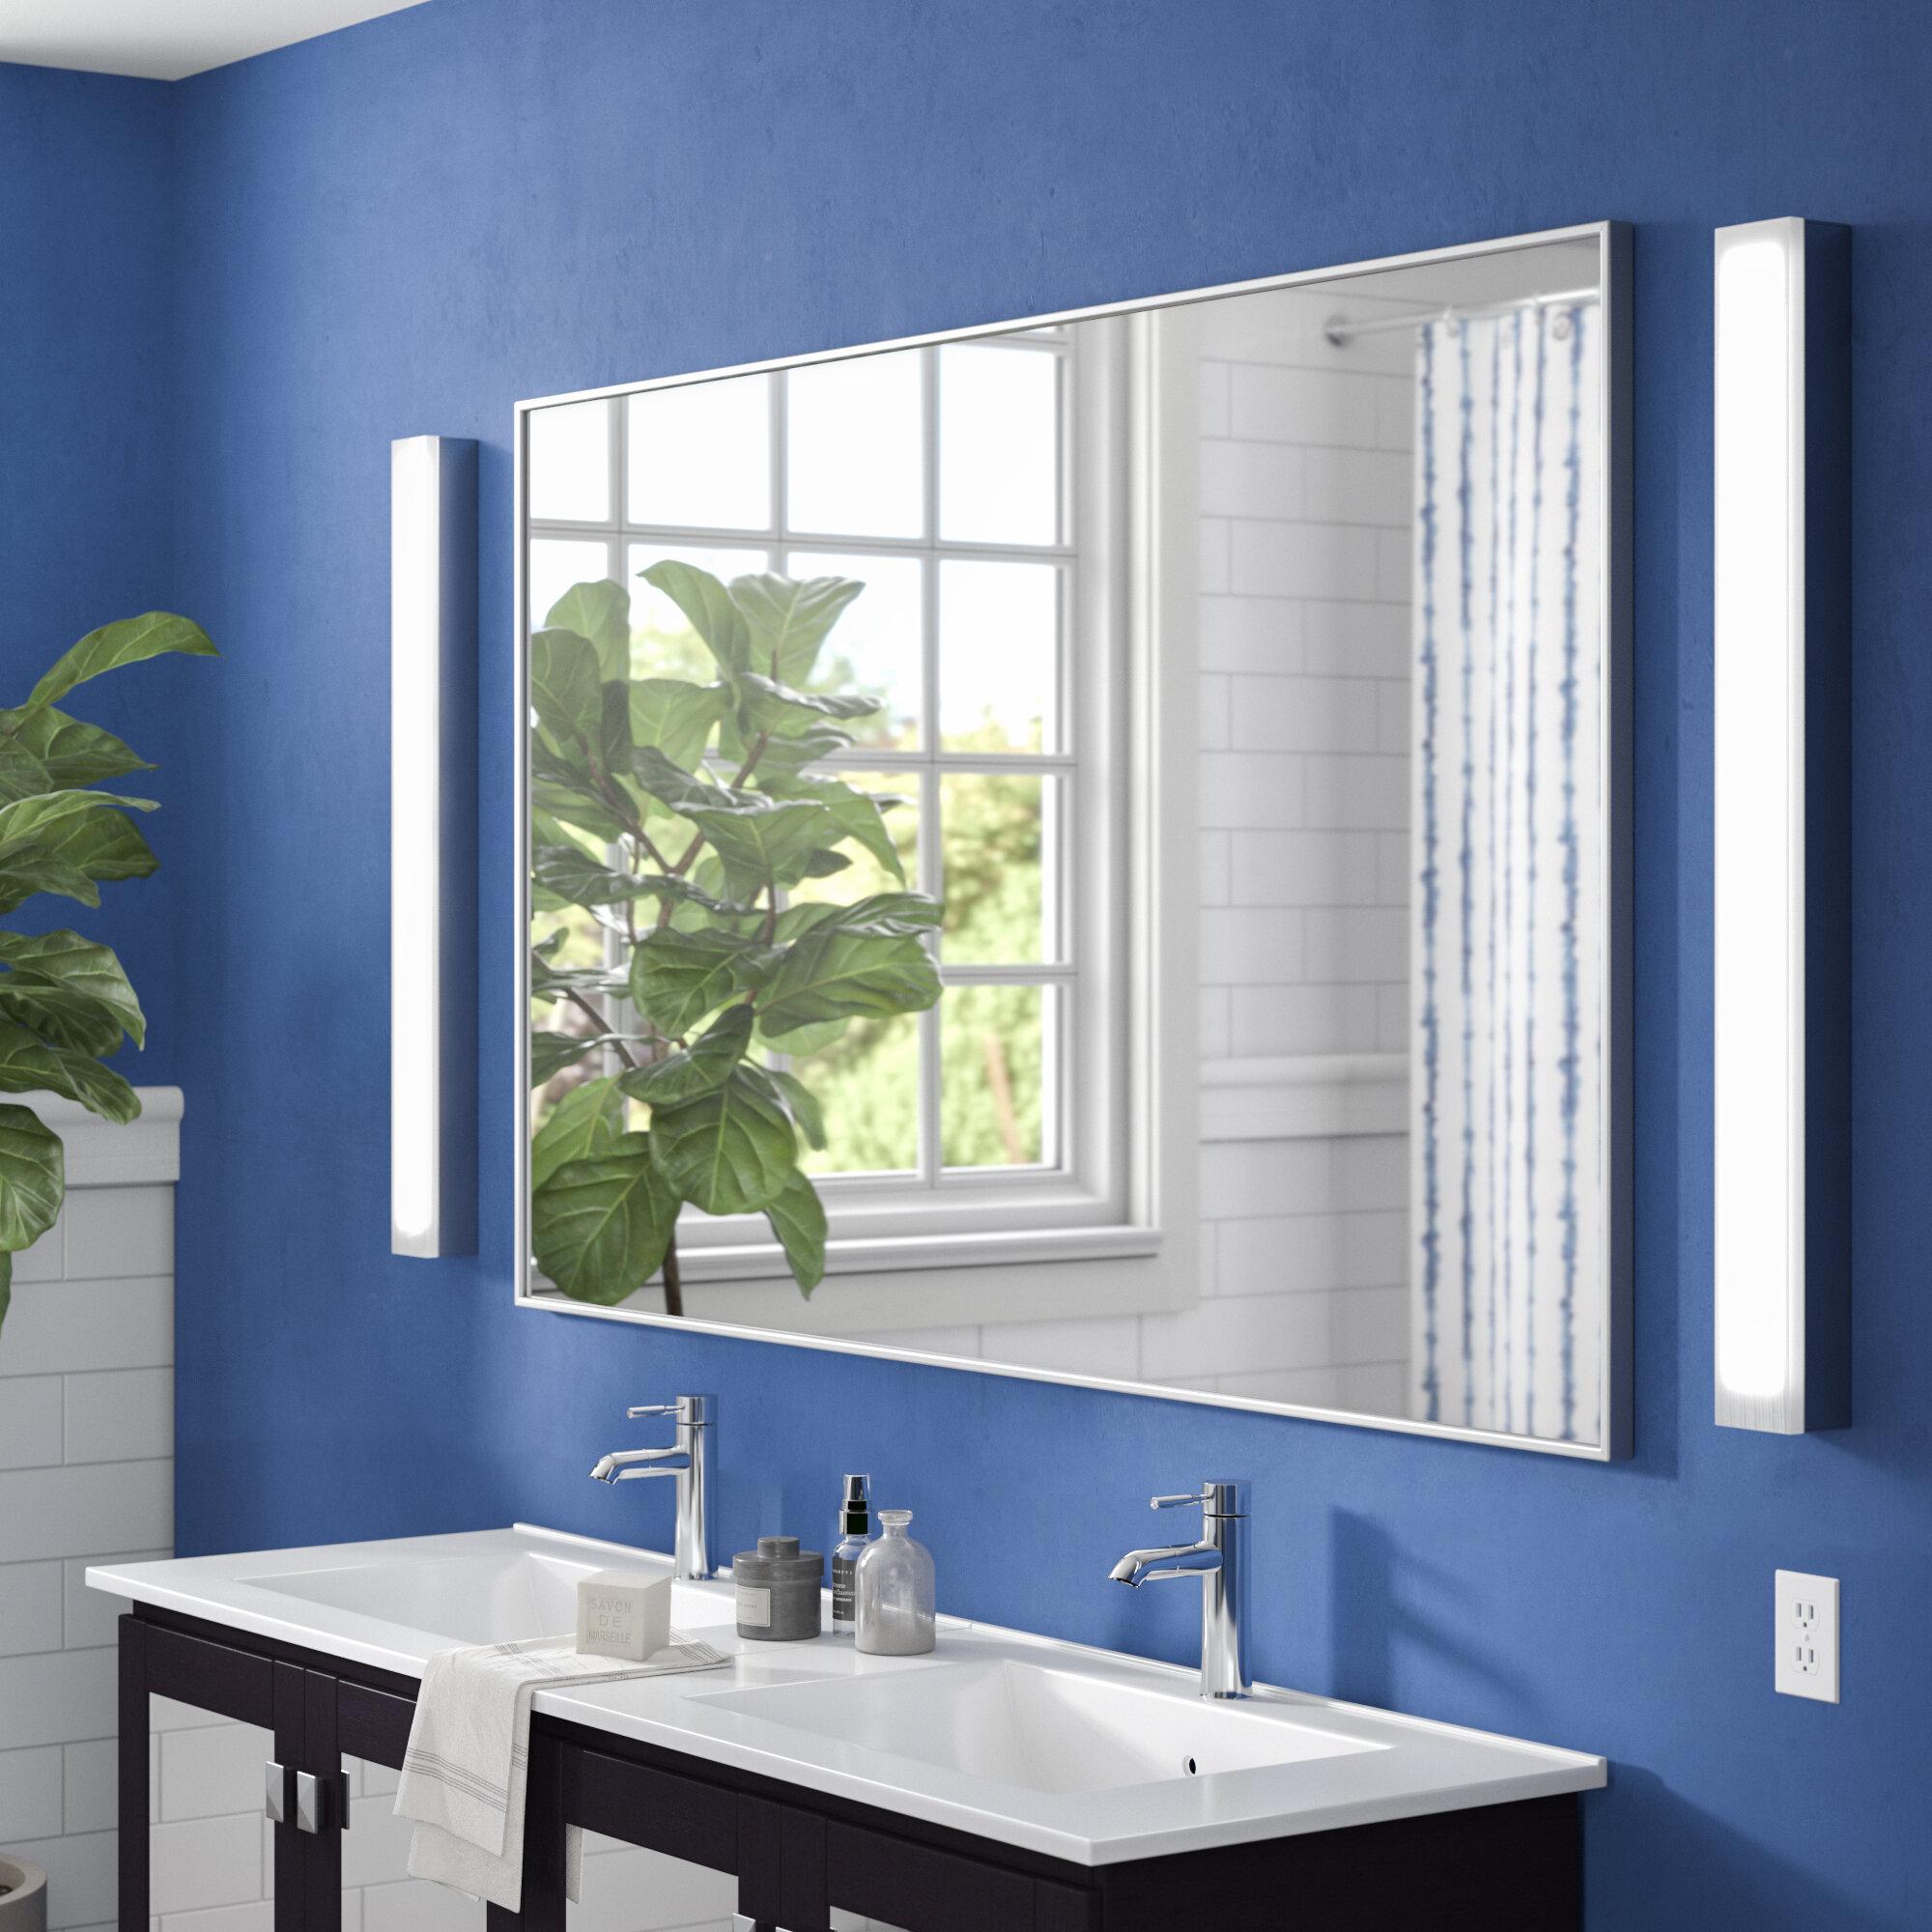 Vanity Mirror.Tinney Modern Contemporary Bathroom Vanity Mirror